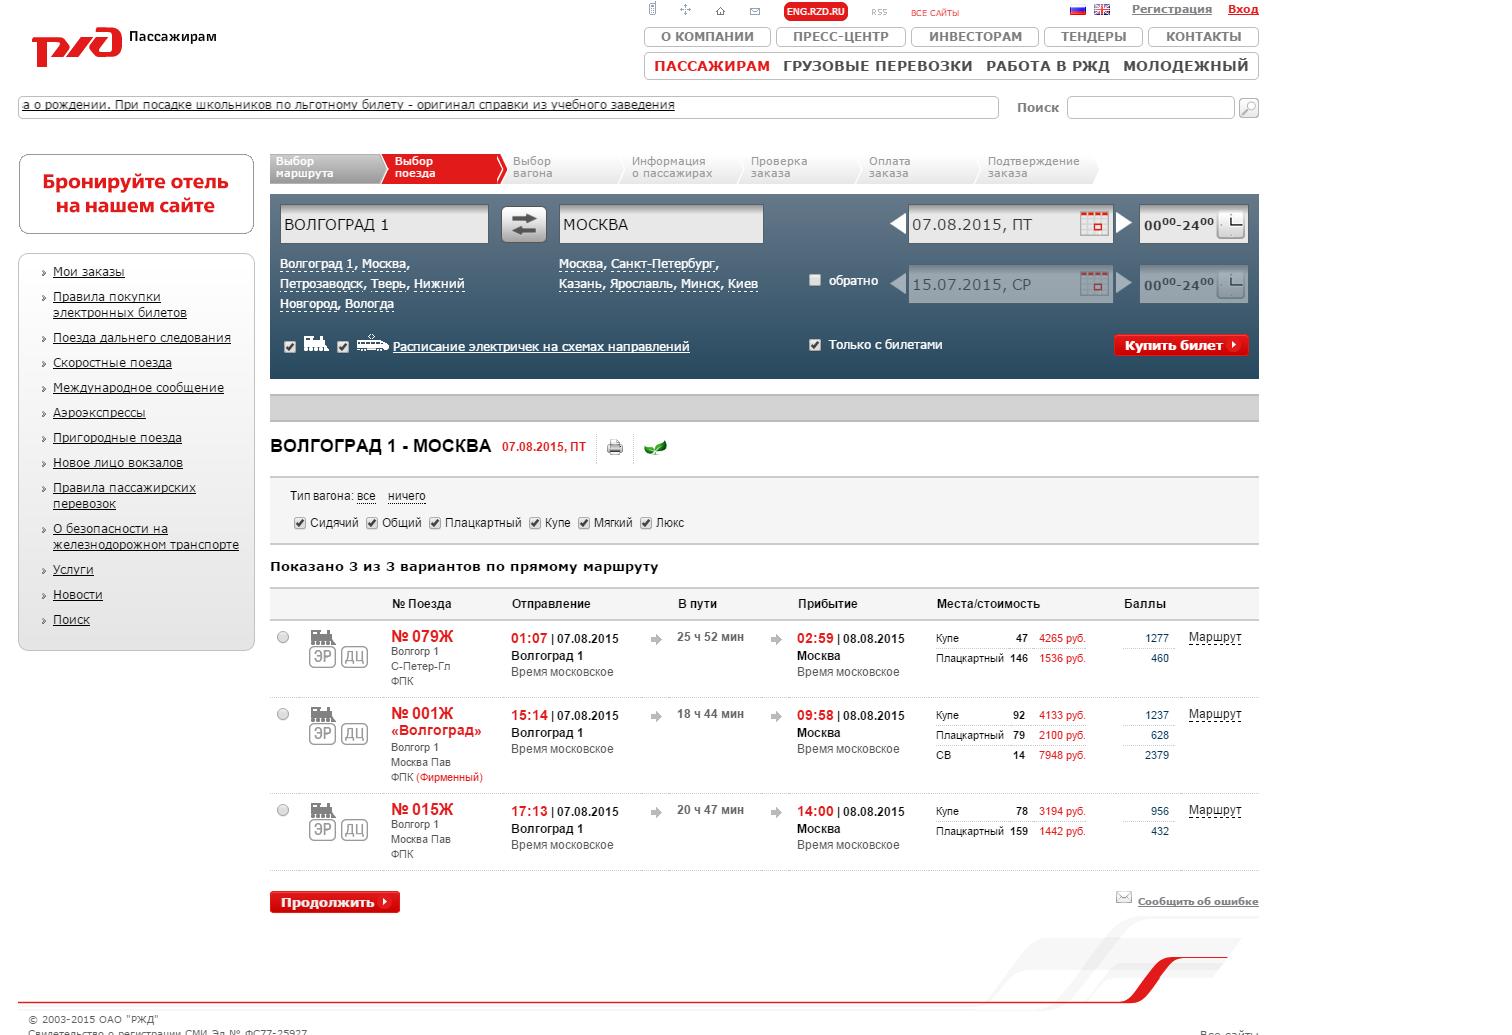 Нажмите на изображение для увеличения Название: FireShot Capture - Пассажирам_ - http___pass.rzd.ru_timetable_public_ru.png Просмотров: 220 Размер:206.5 Кб ID:185268